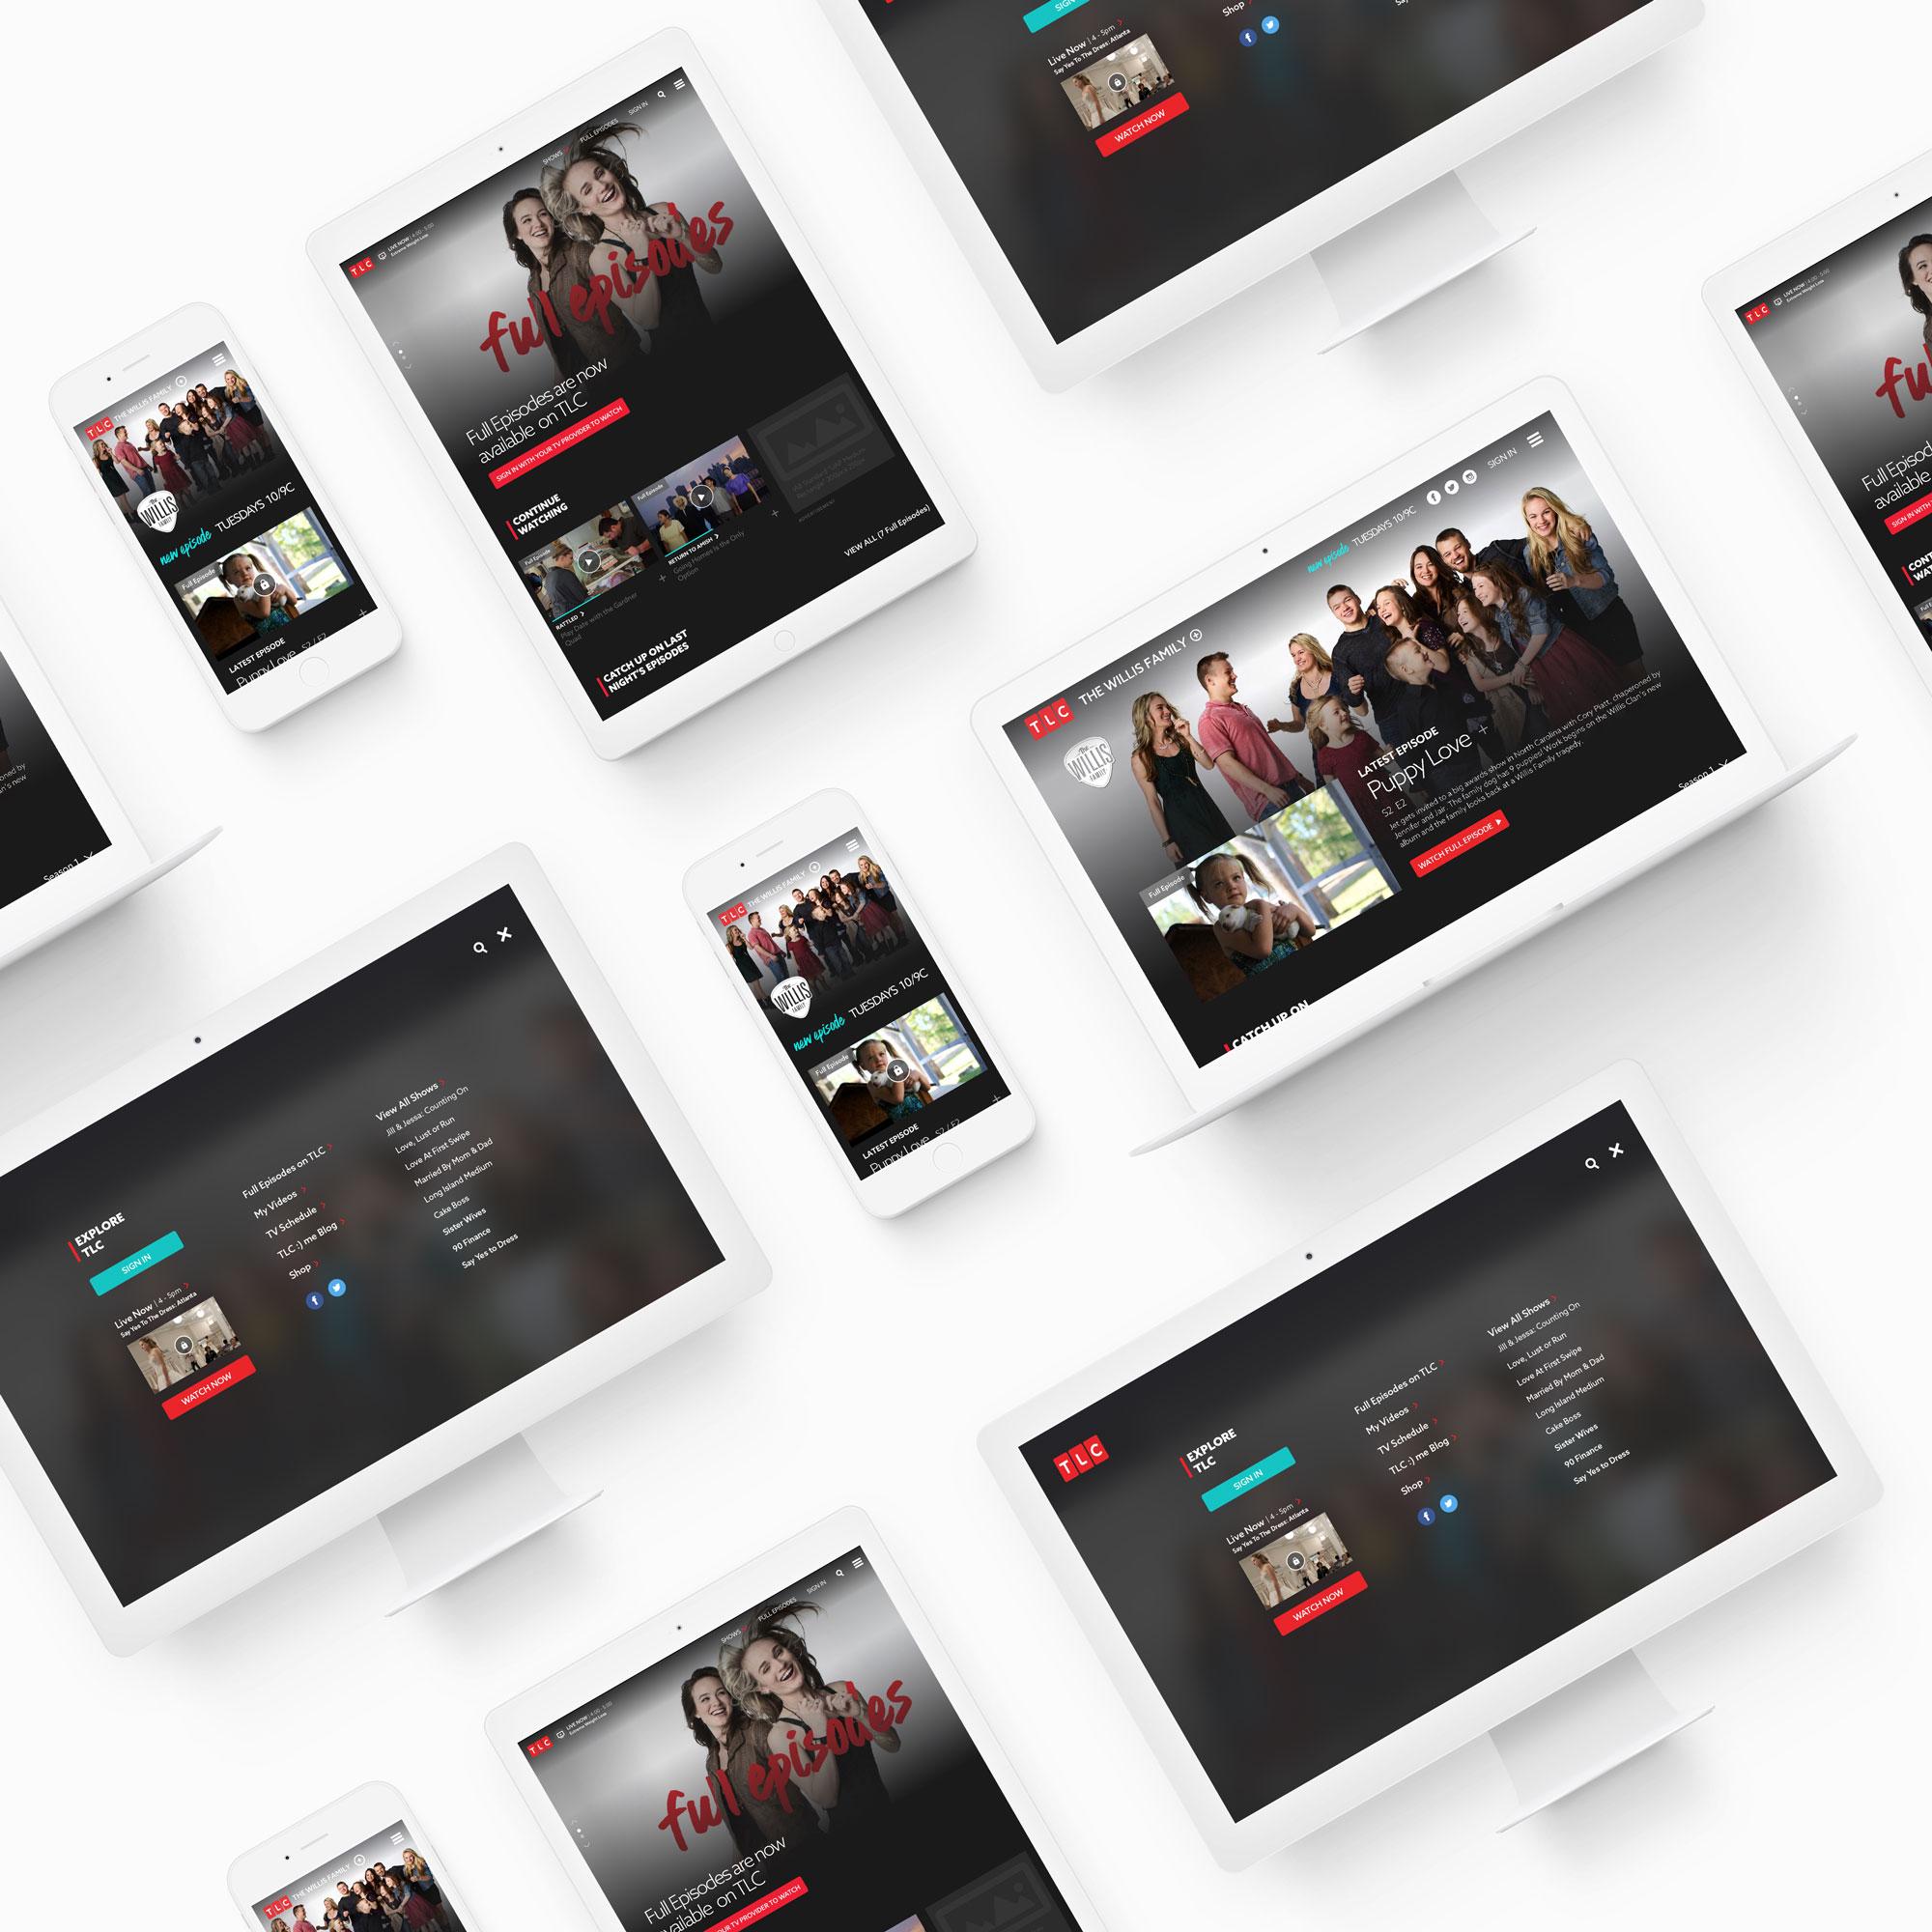 Subtle-Devices-Showcase-Screens-Presentation.jpg